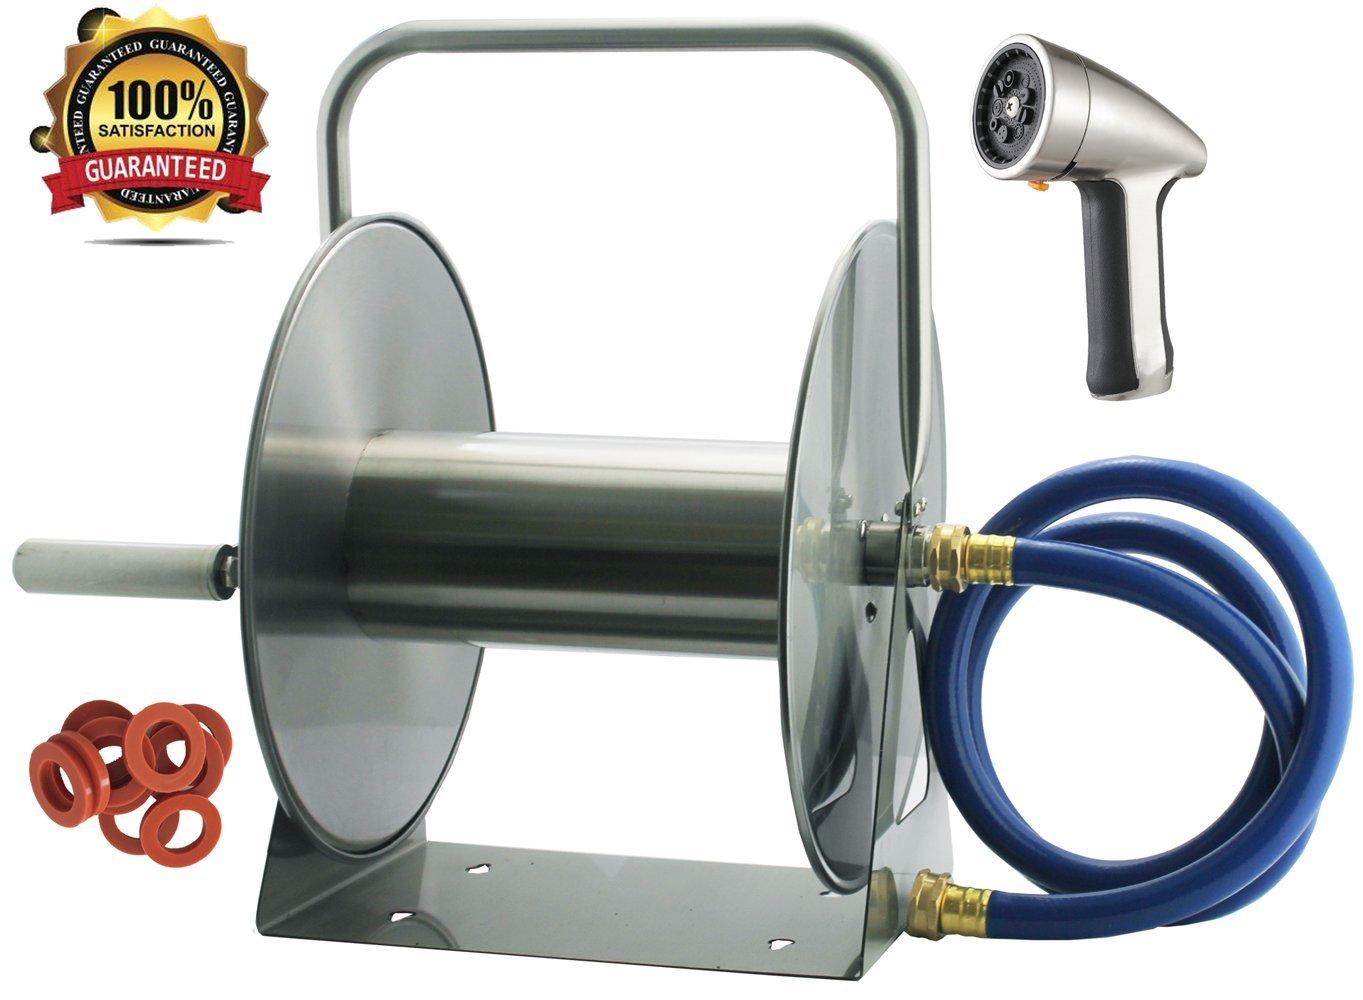 3-in-1 Deluxe Combo: Stainless Steel Garden Hose Reel with ...